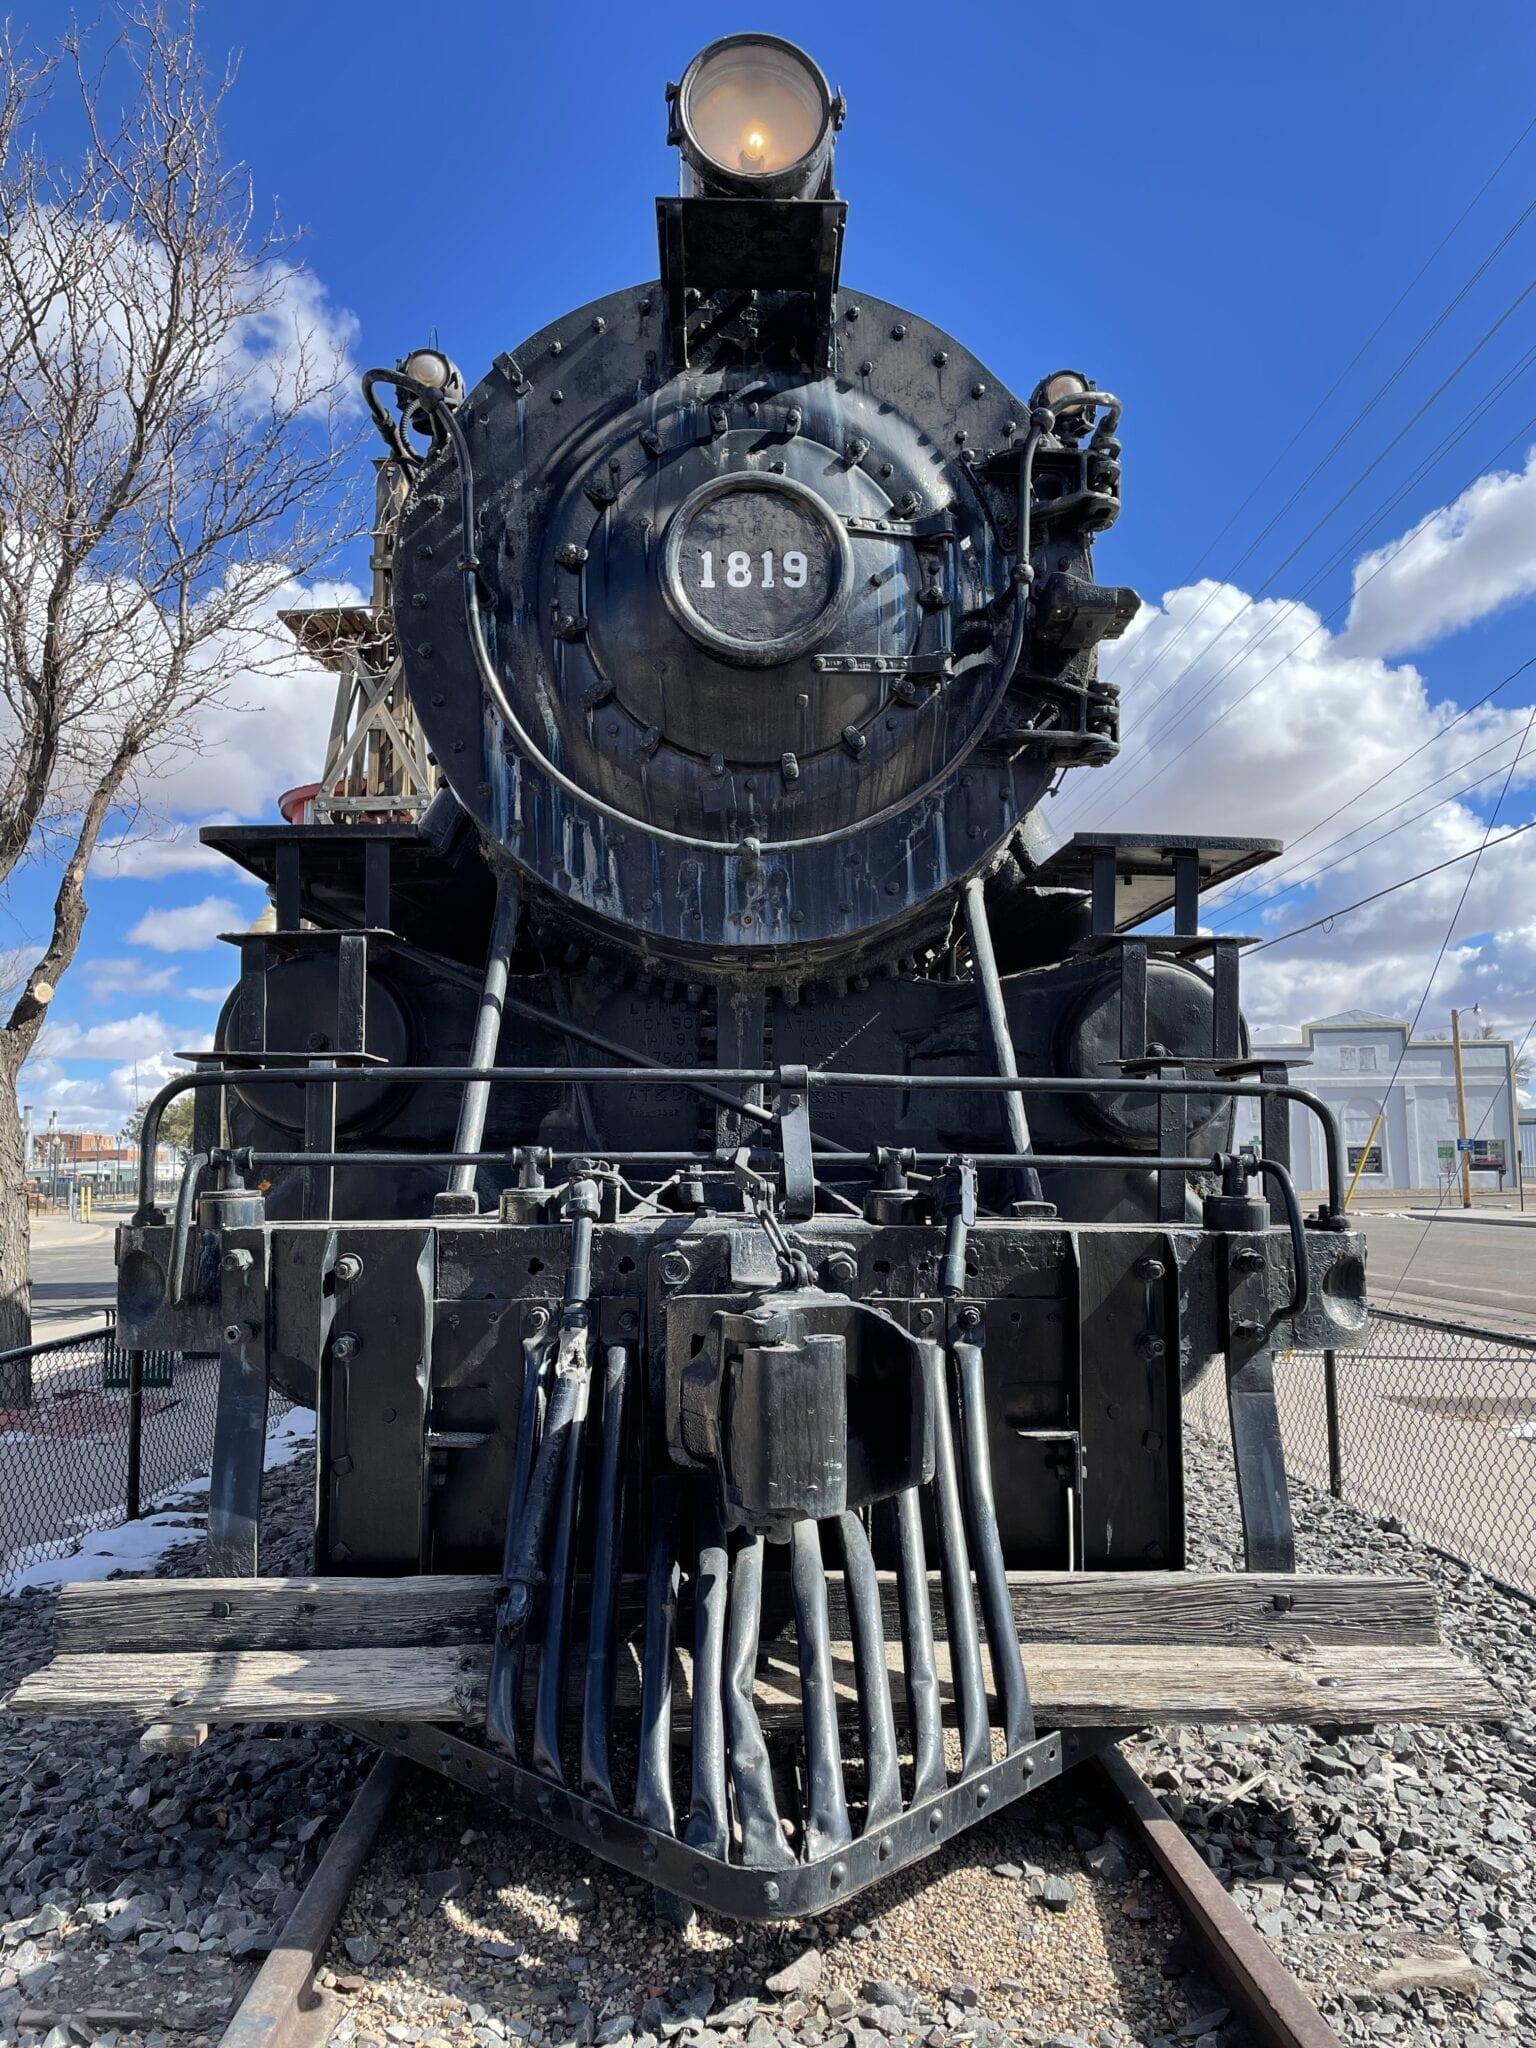 image of steam engine in lamar